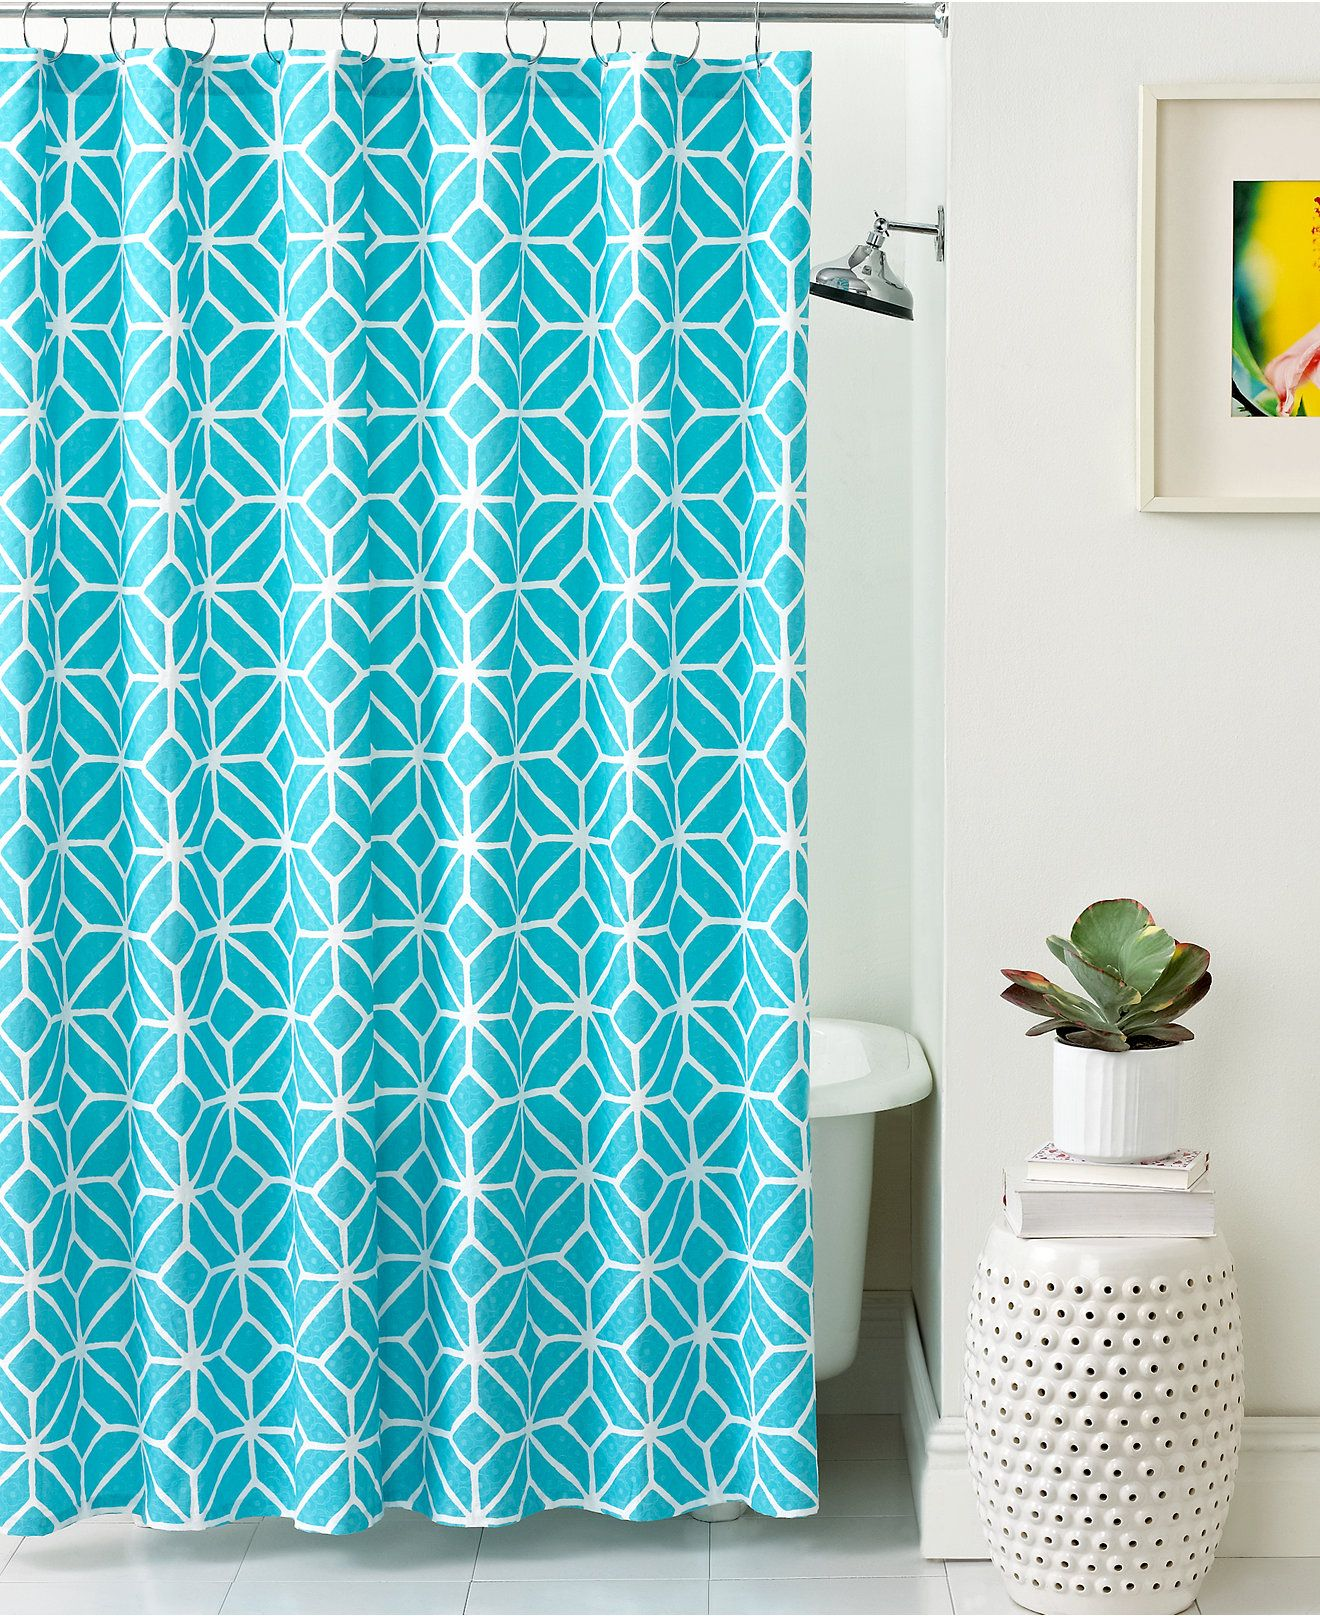 Trina Turk Bath Trellis Shower Curtain Shower Curtains